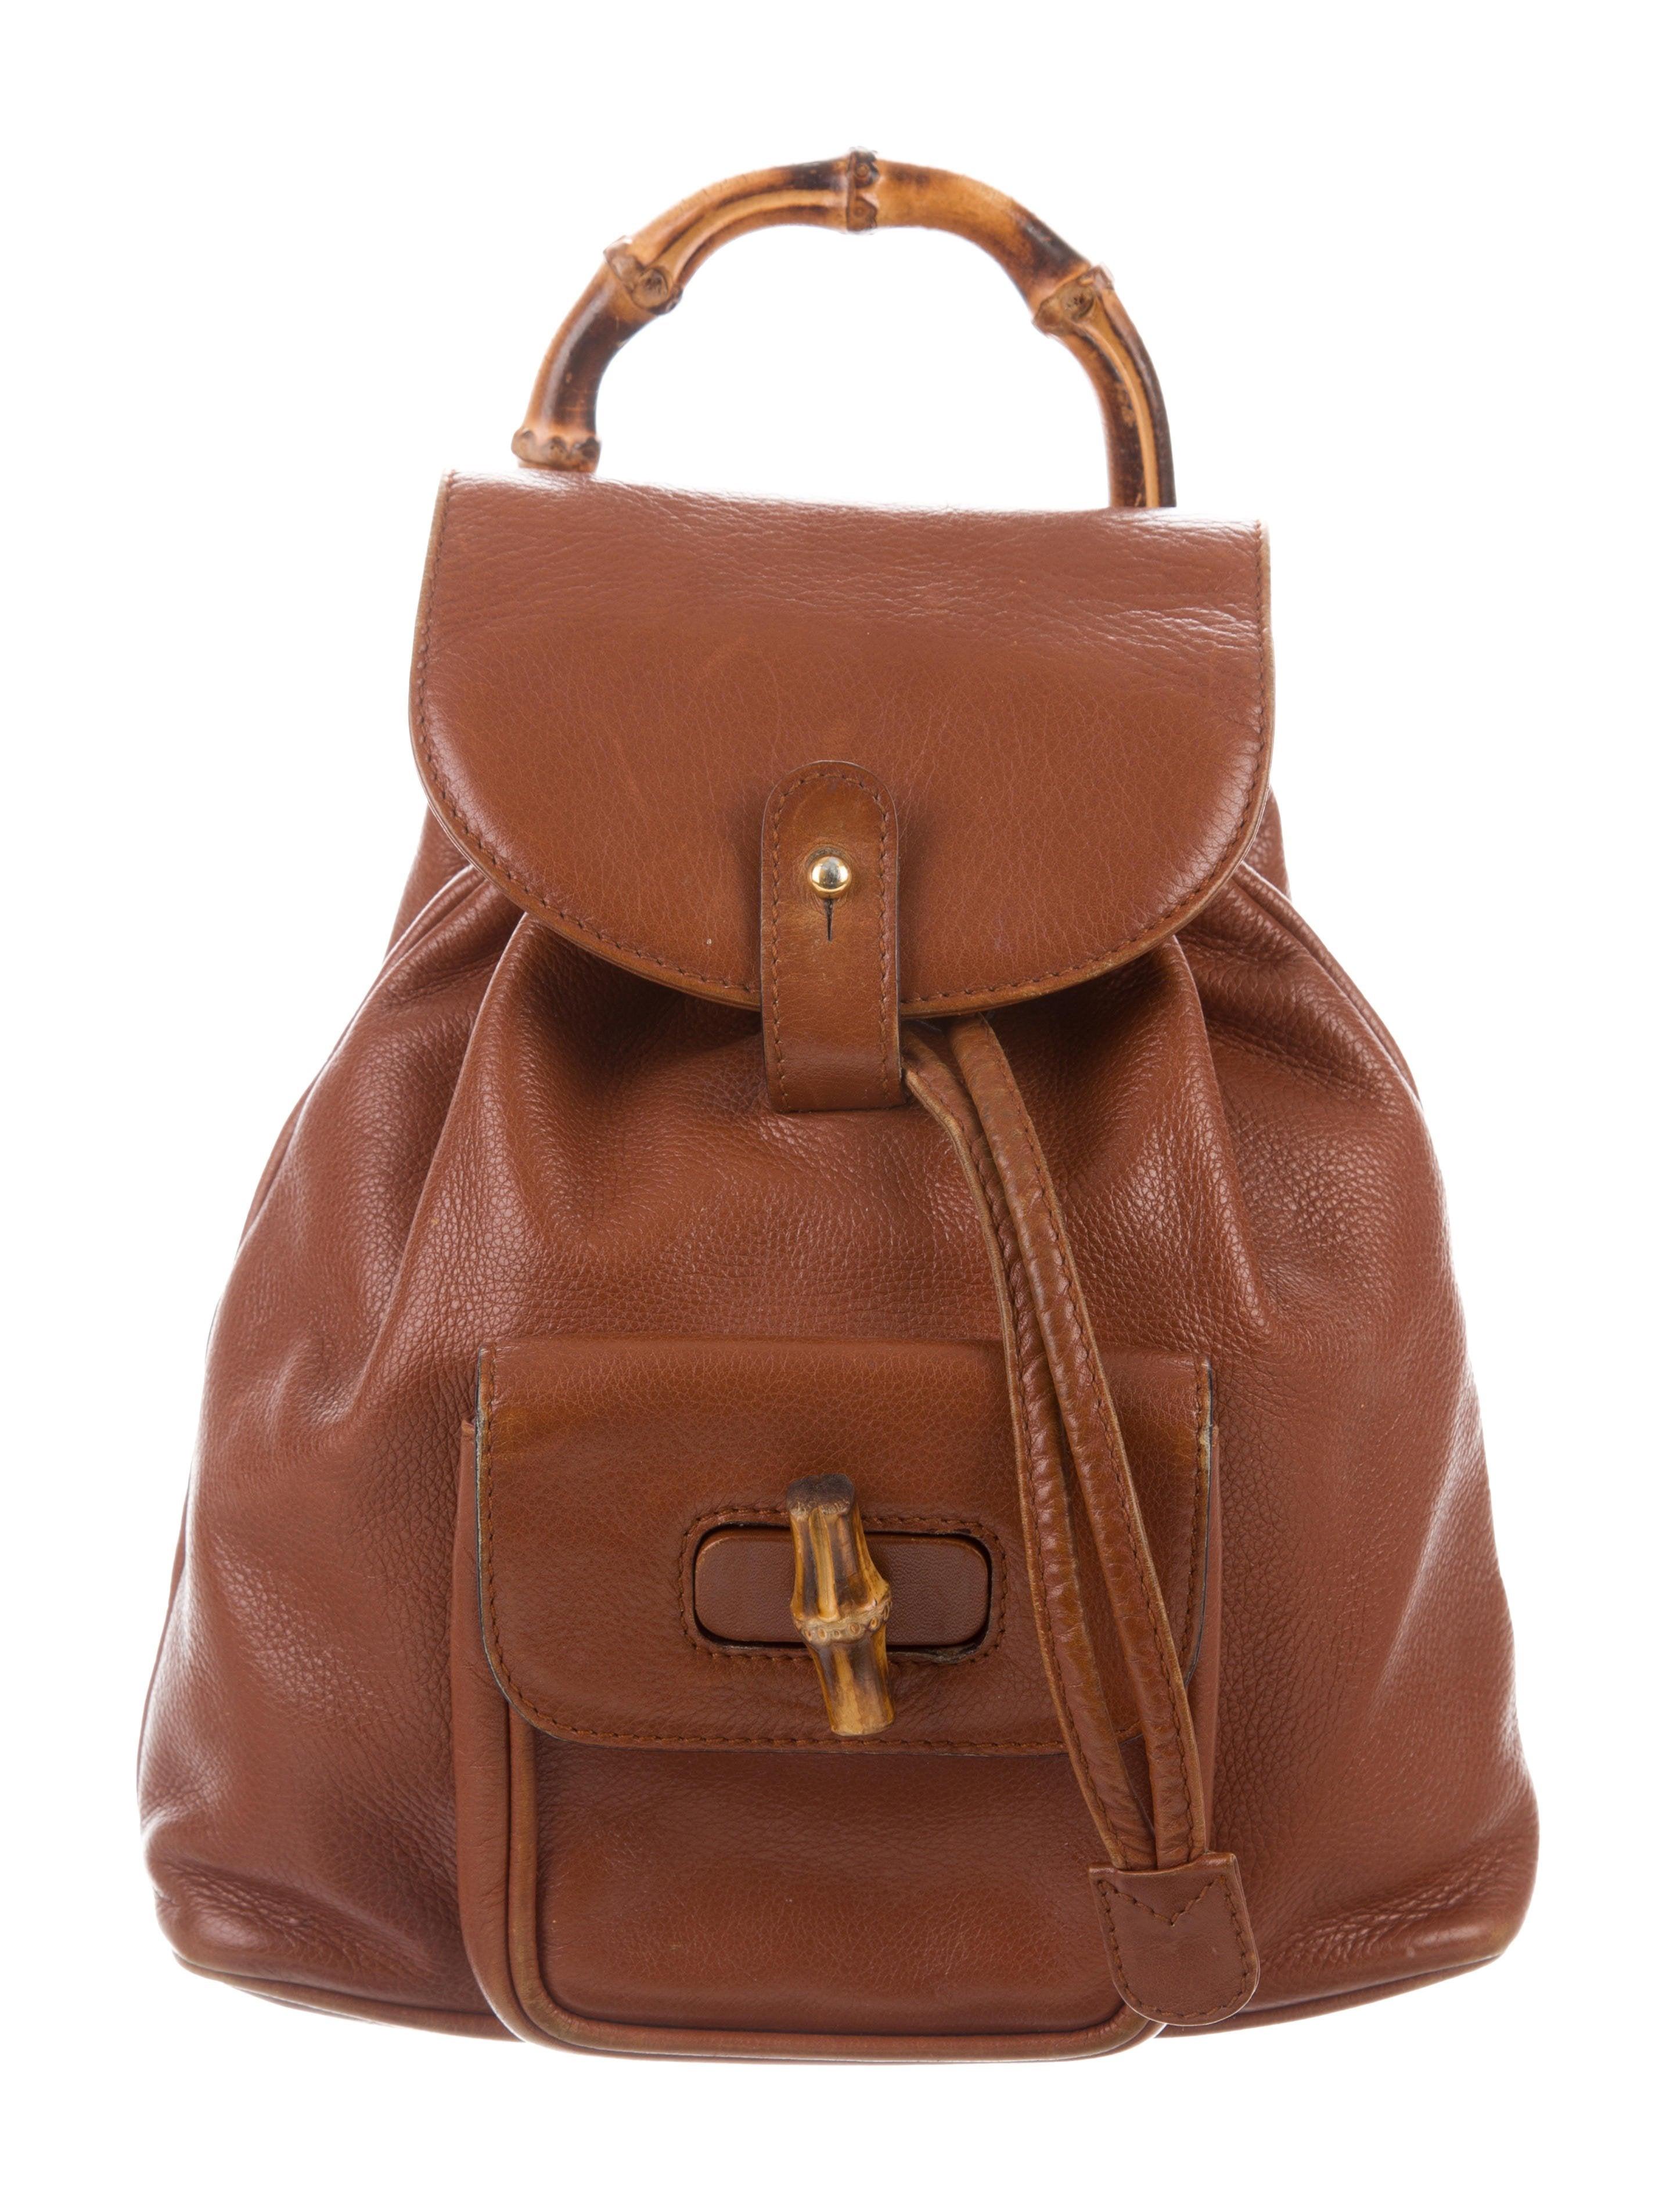 cccda3ff8bda Gucci Vintage Mini Bamboo Backpack - Handbags - GUC281376